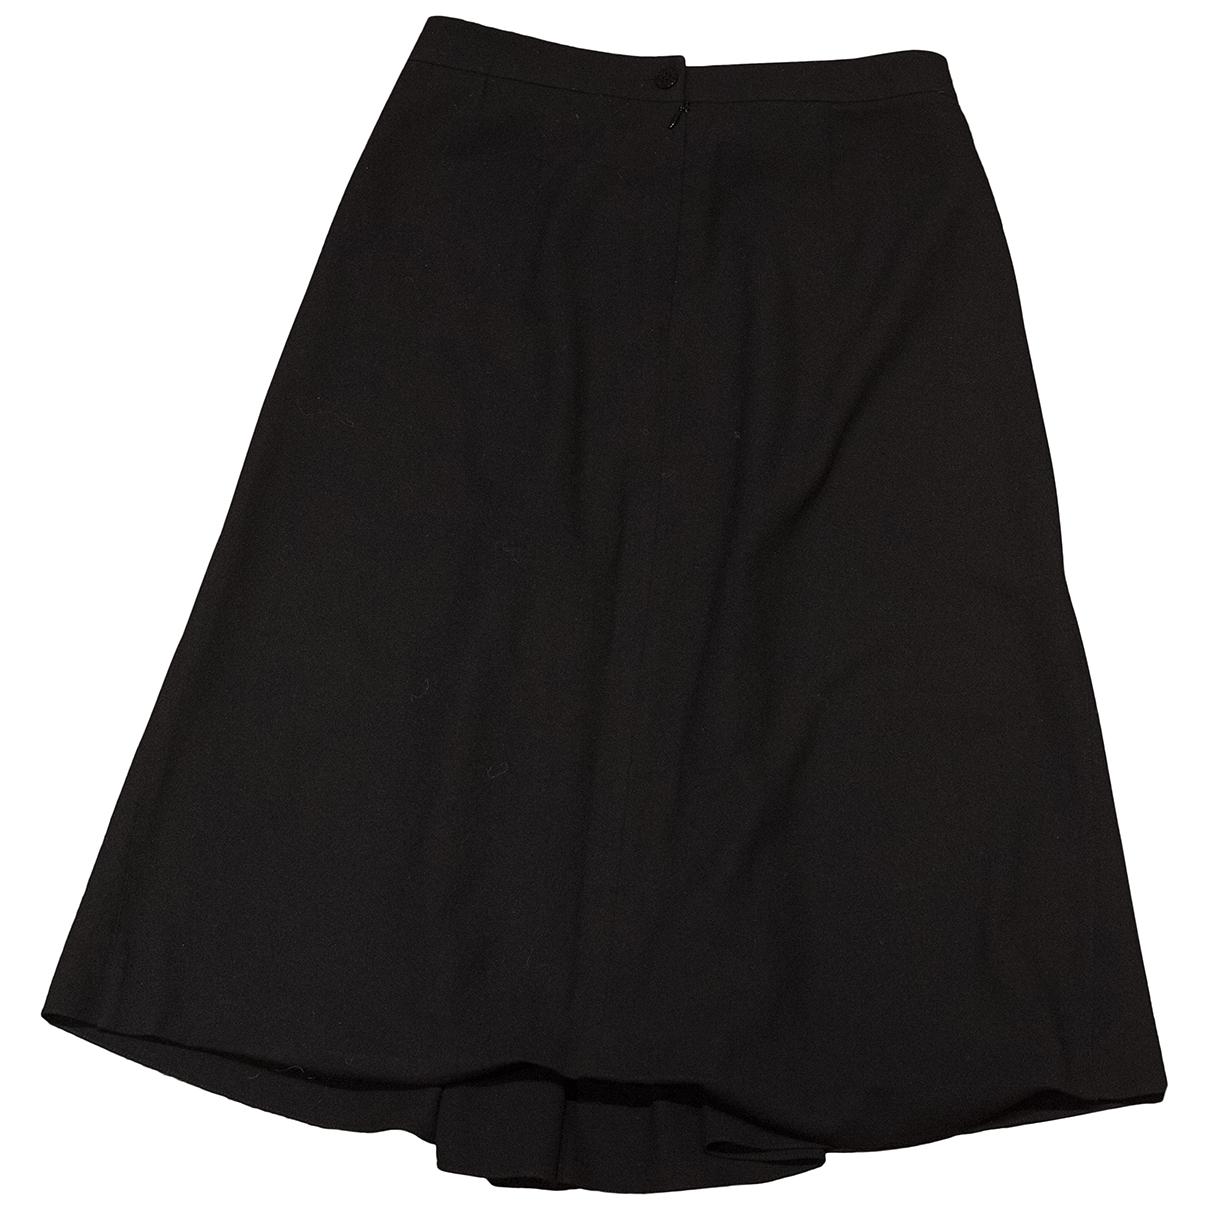 Hermès \N Black Wool skirt for Women 36 FR